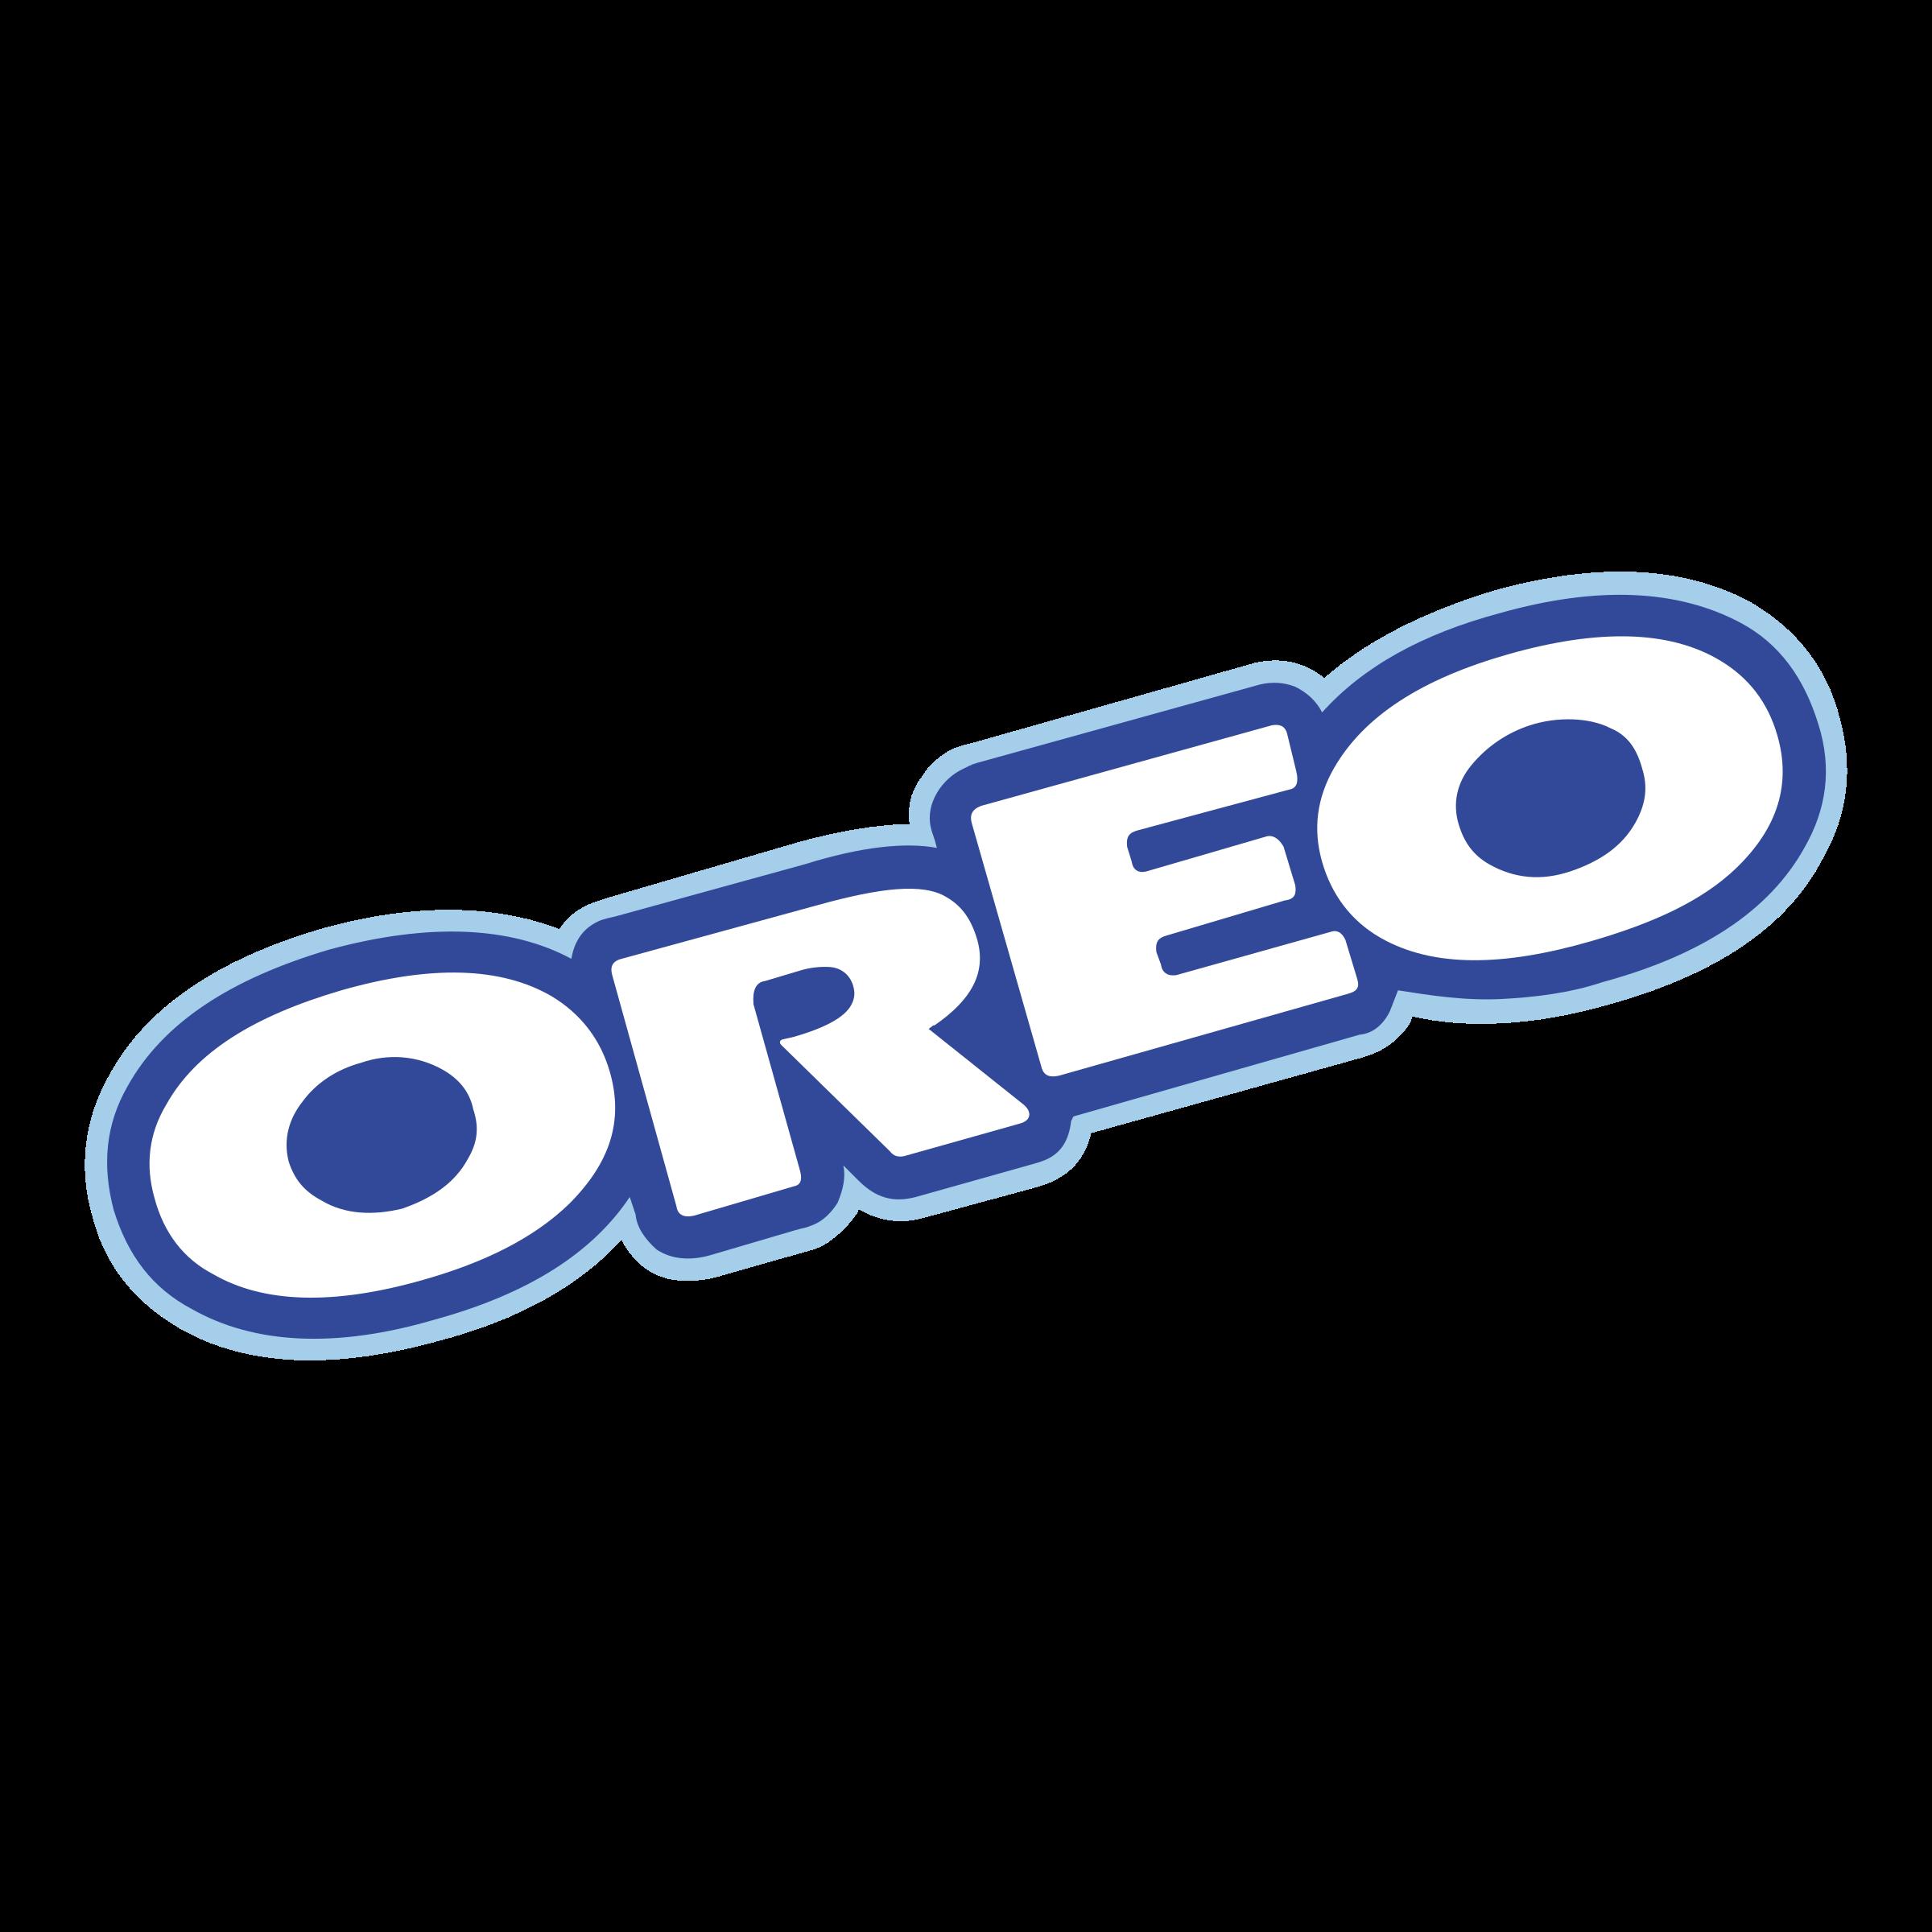 Logo png transparent svg. Oreo clipart symbol